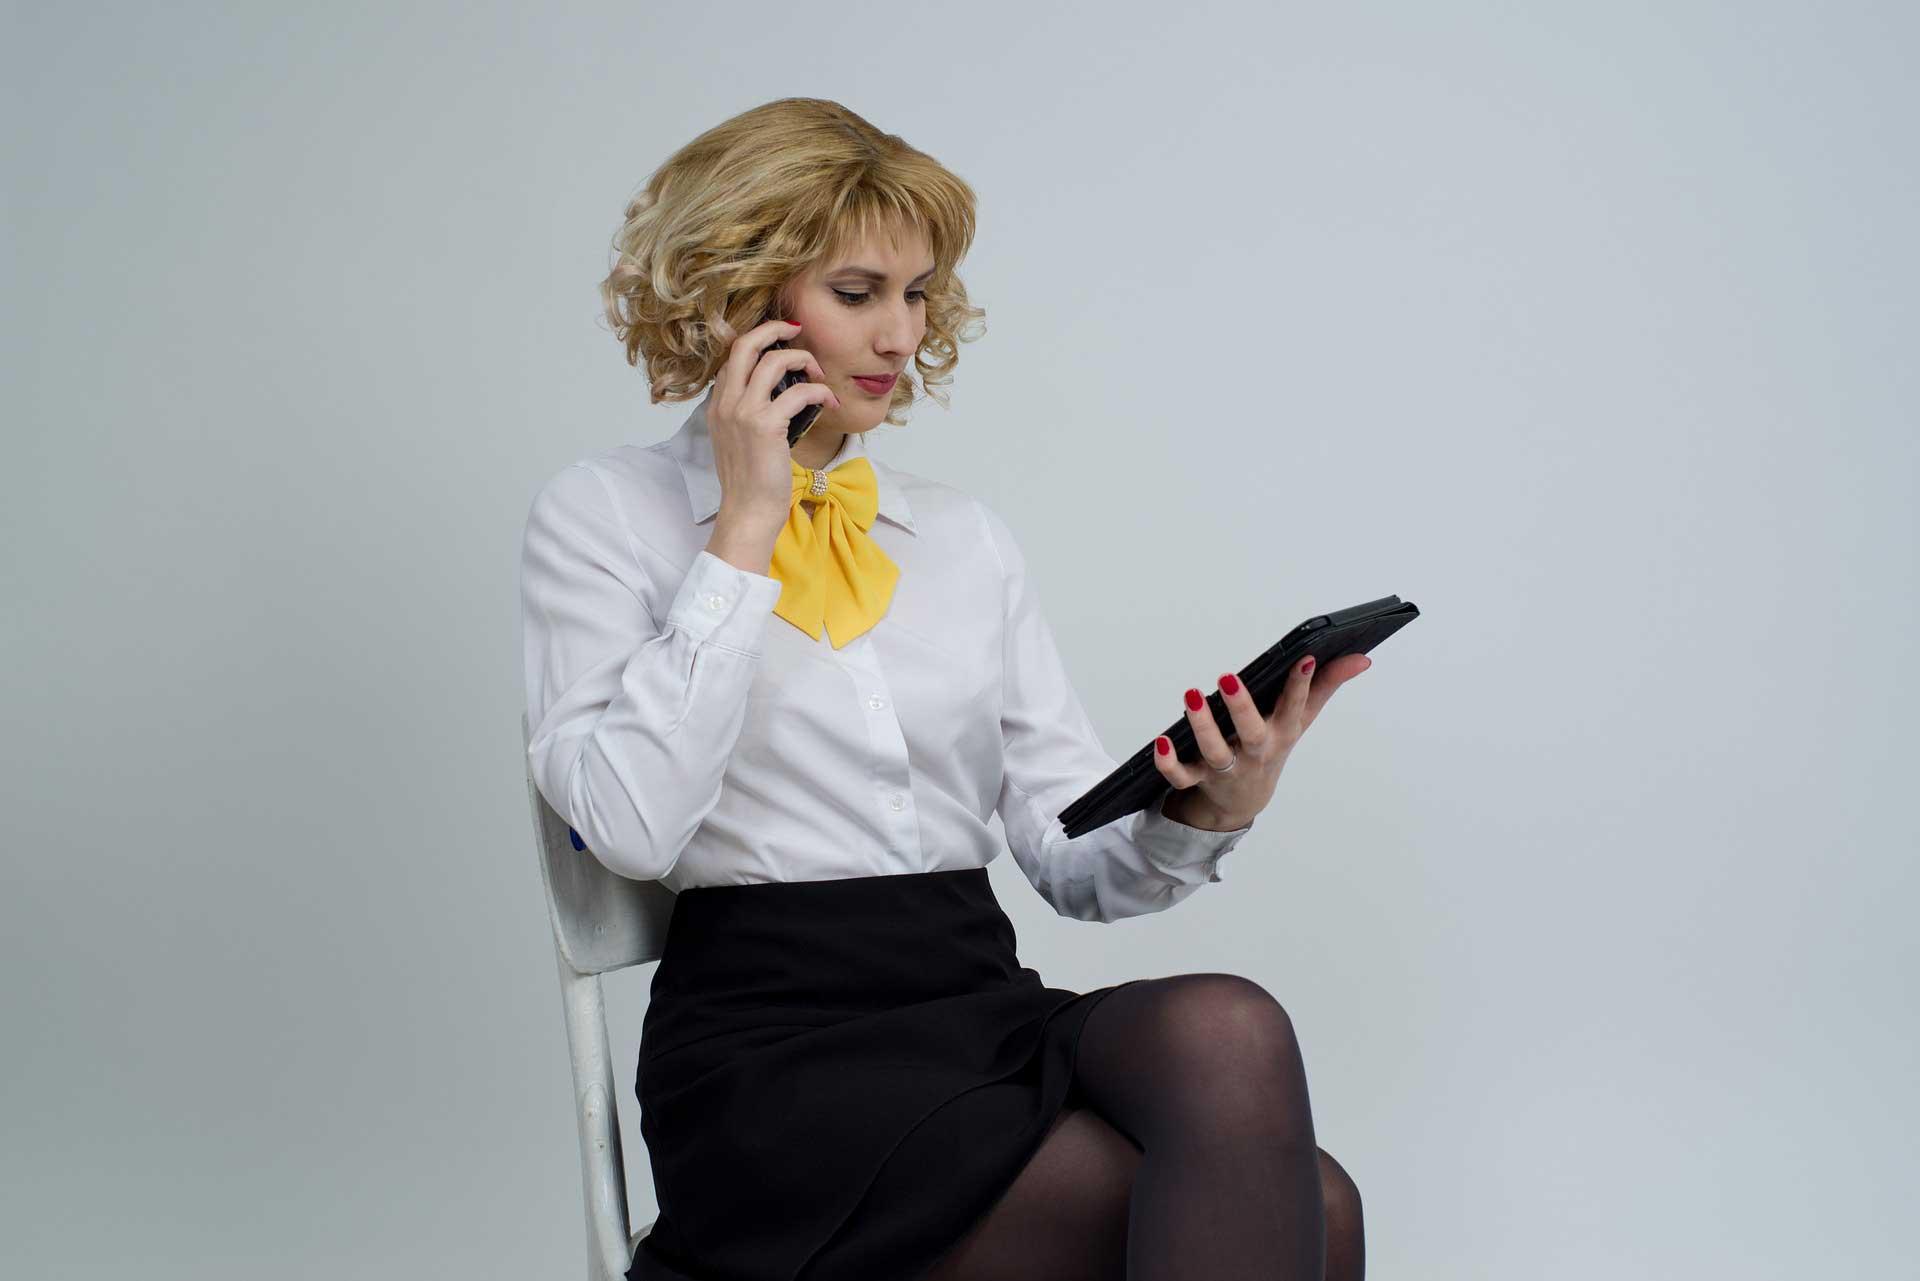 Elinde Telefon ve Tablet Olan Is Kadini